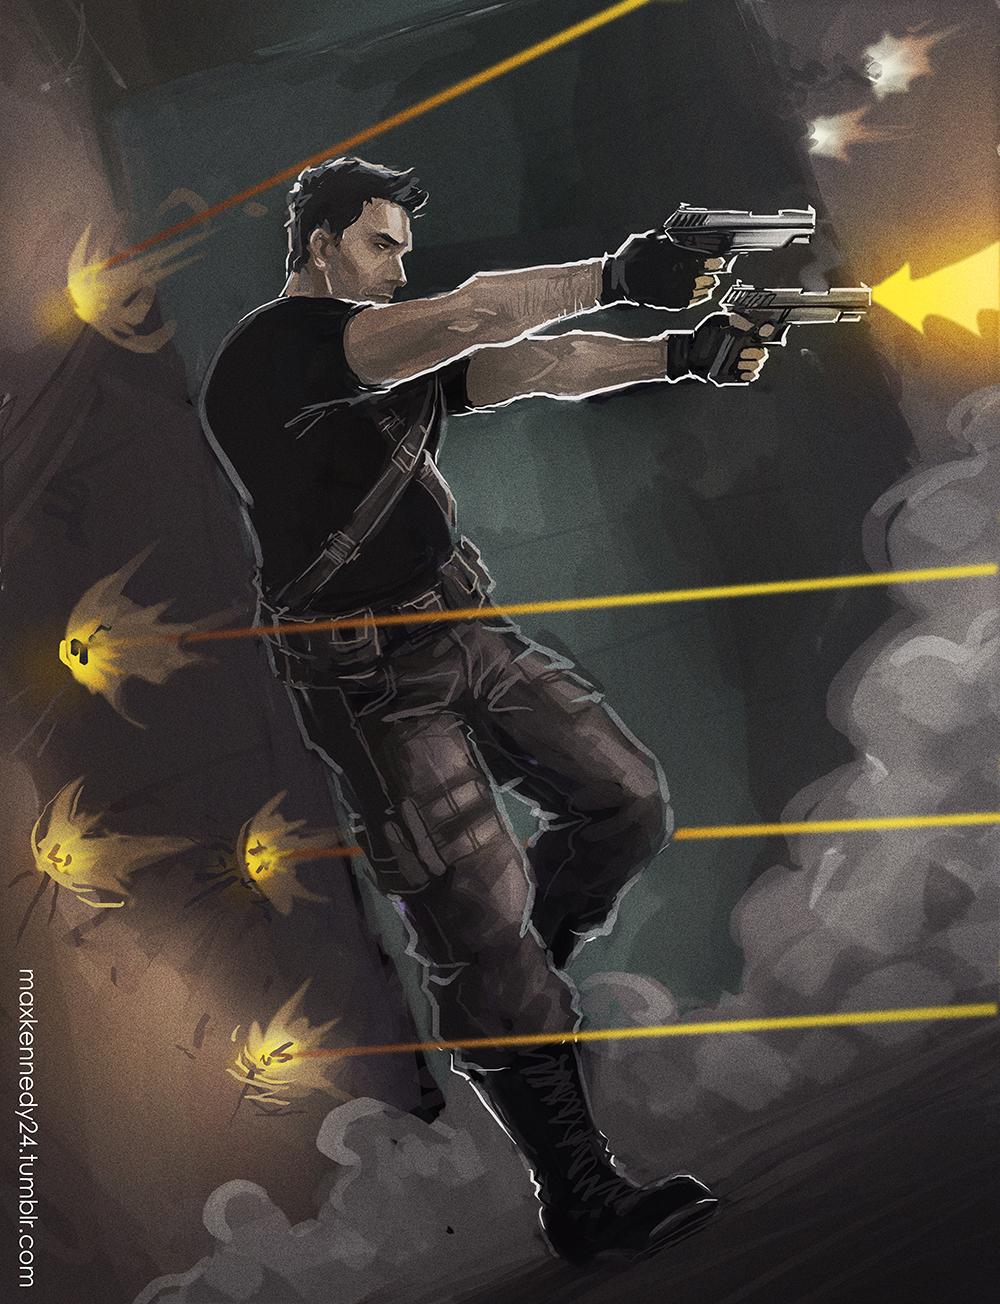 Captain America: The Winter Soldier - Guns by maXKennedy on DeviantArt